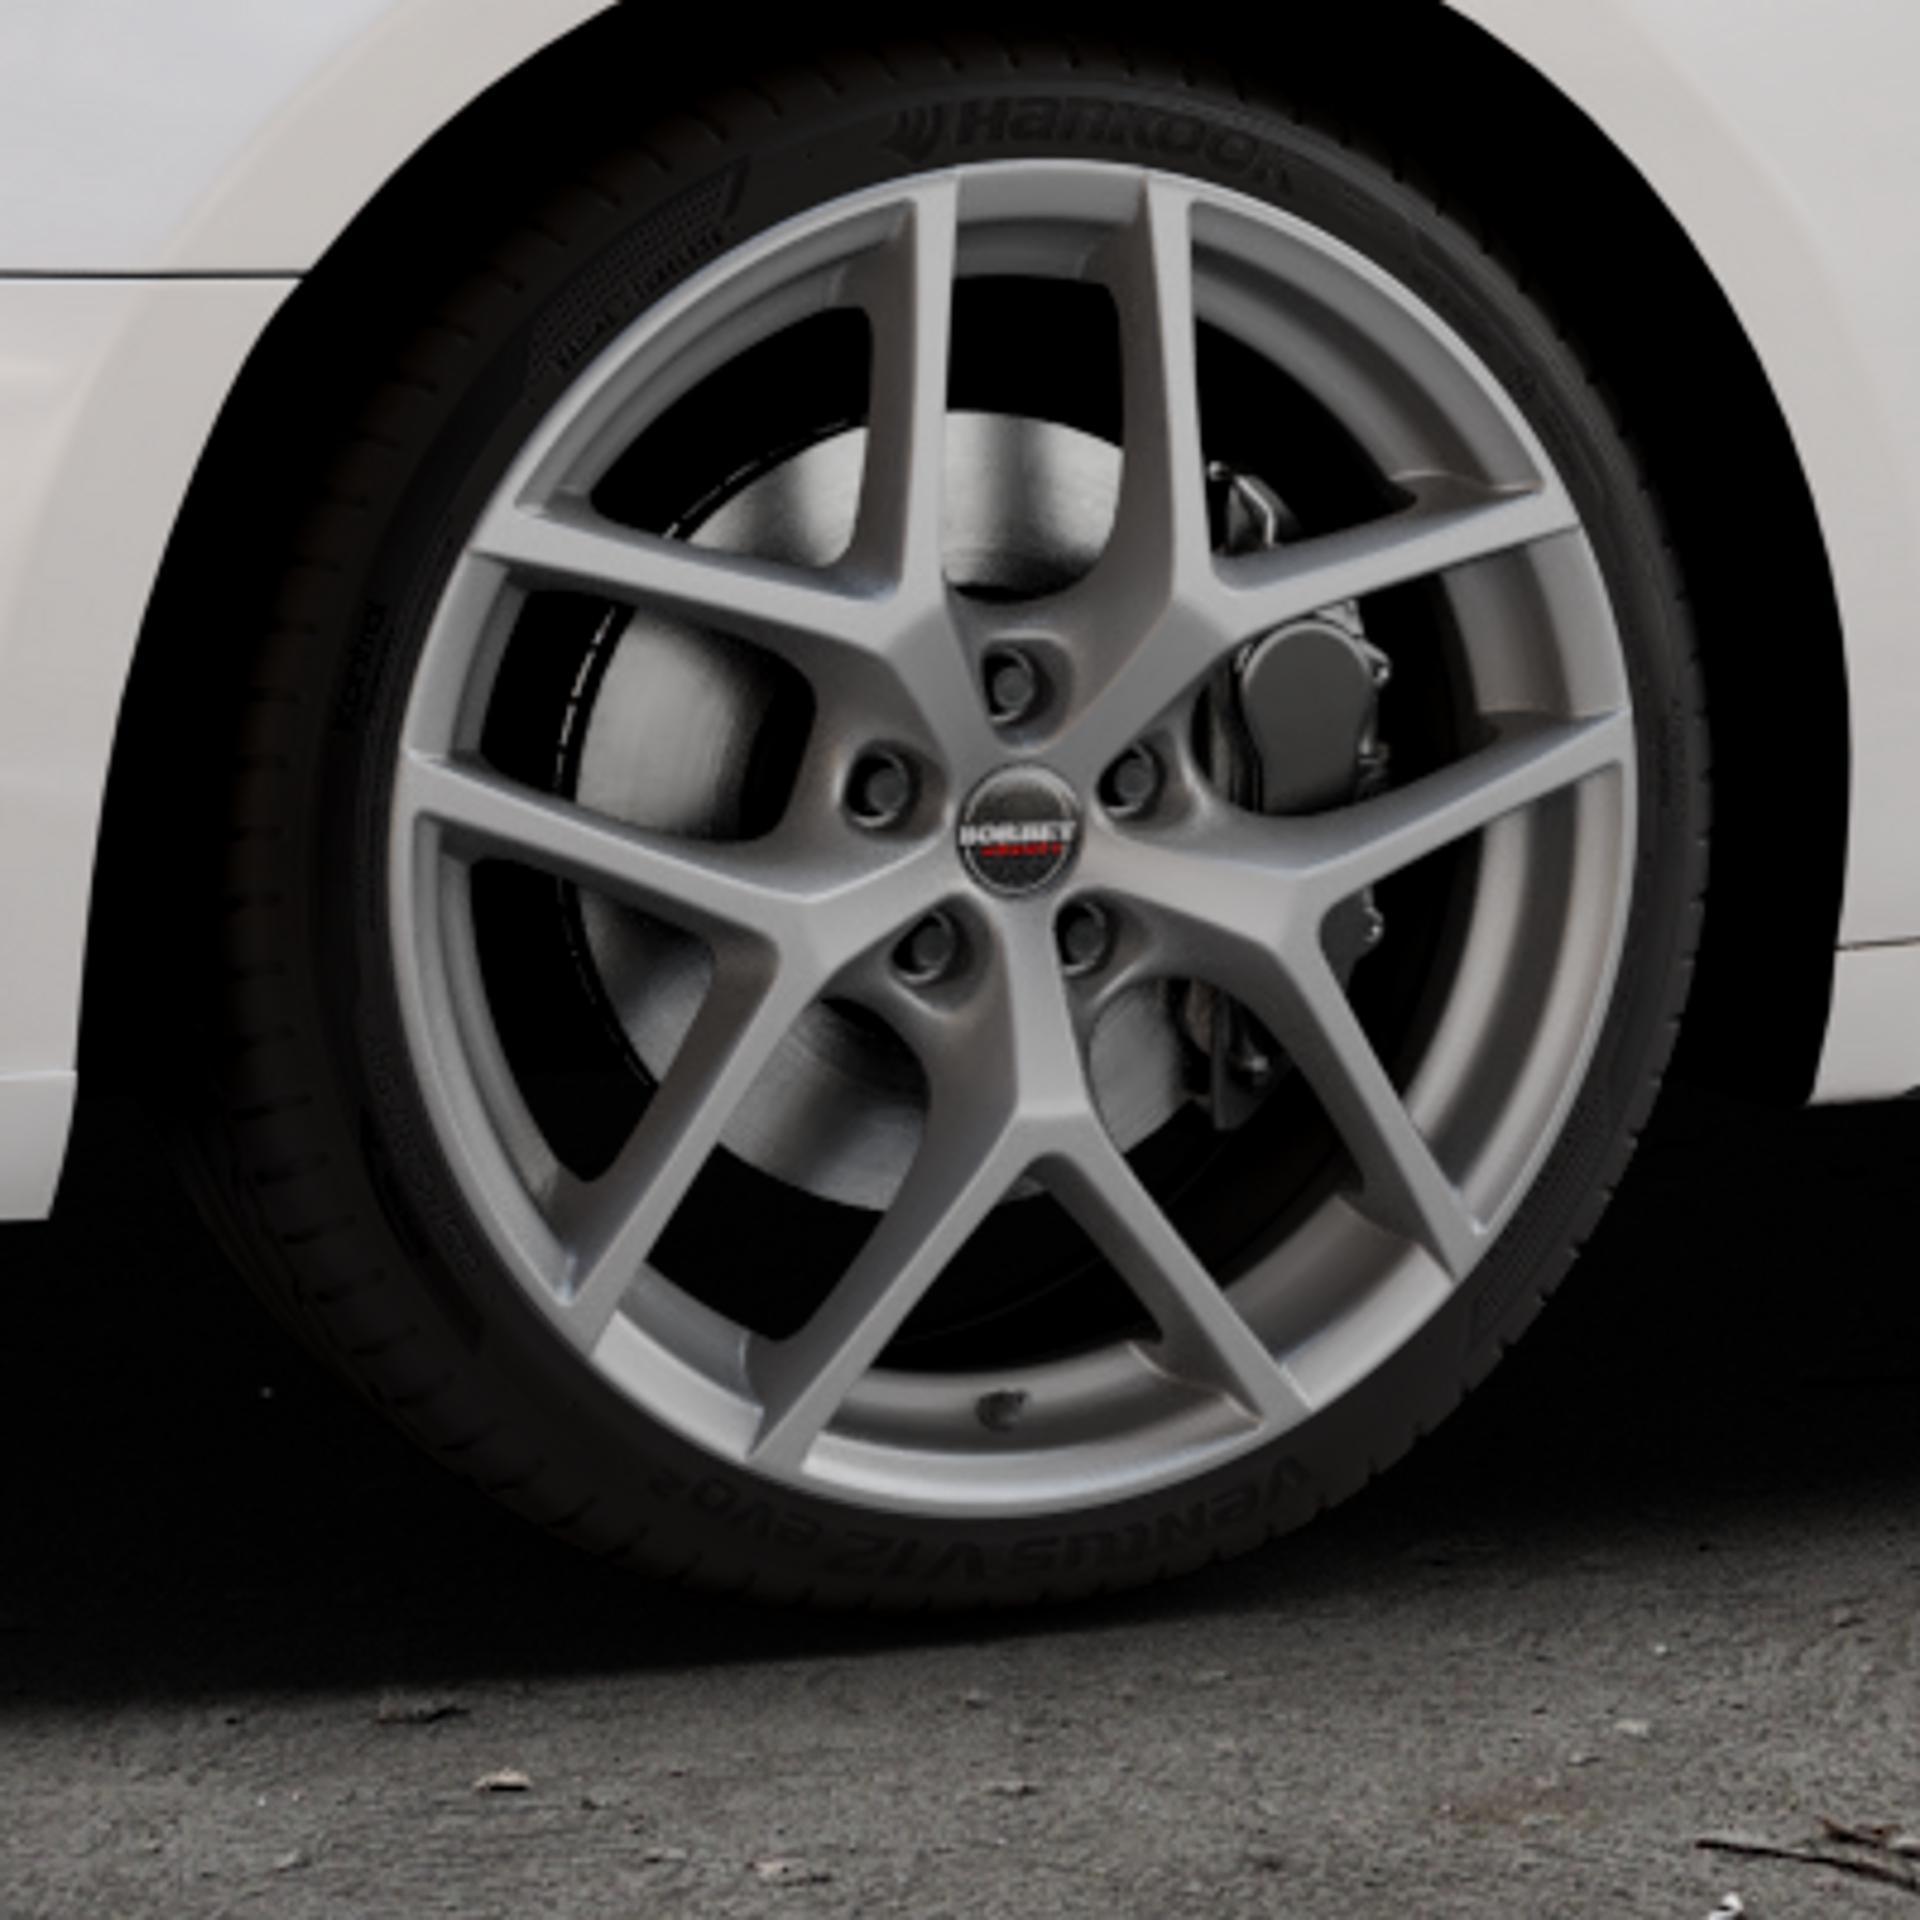 Borbet Y titan matt Felge mit Reifen grau in 19Zoll Winterfelge Alufelge auf weissem Audi A5 Typ B9 (Sportback) 2,0l TDI 140kW (190 PS) quattro TFSI 185kW (252 3,0l 160kW (218 200kW (272 1,4l 110kW (150 183kW (249 g-tron 125kW (170 Mild-Hybrid 100kW (136 210kW (286 45 180kW (245 35 40 50 170kW (231 120kW (163 30 ⬇️ mit 15mm Ti